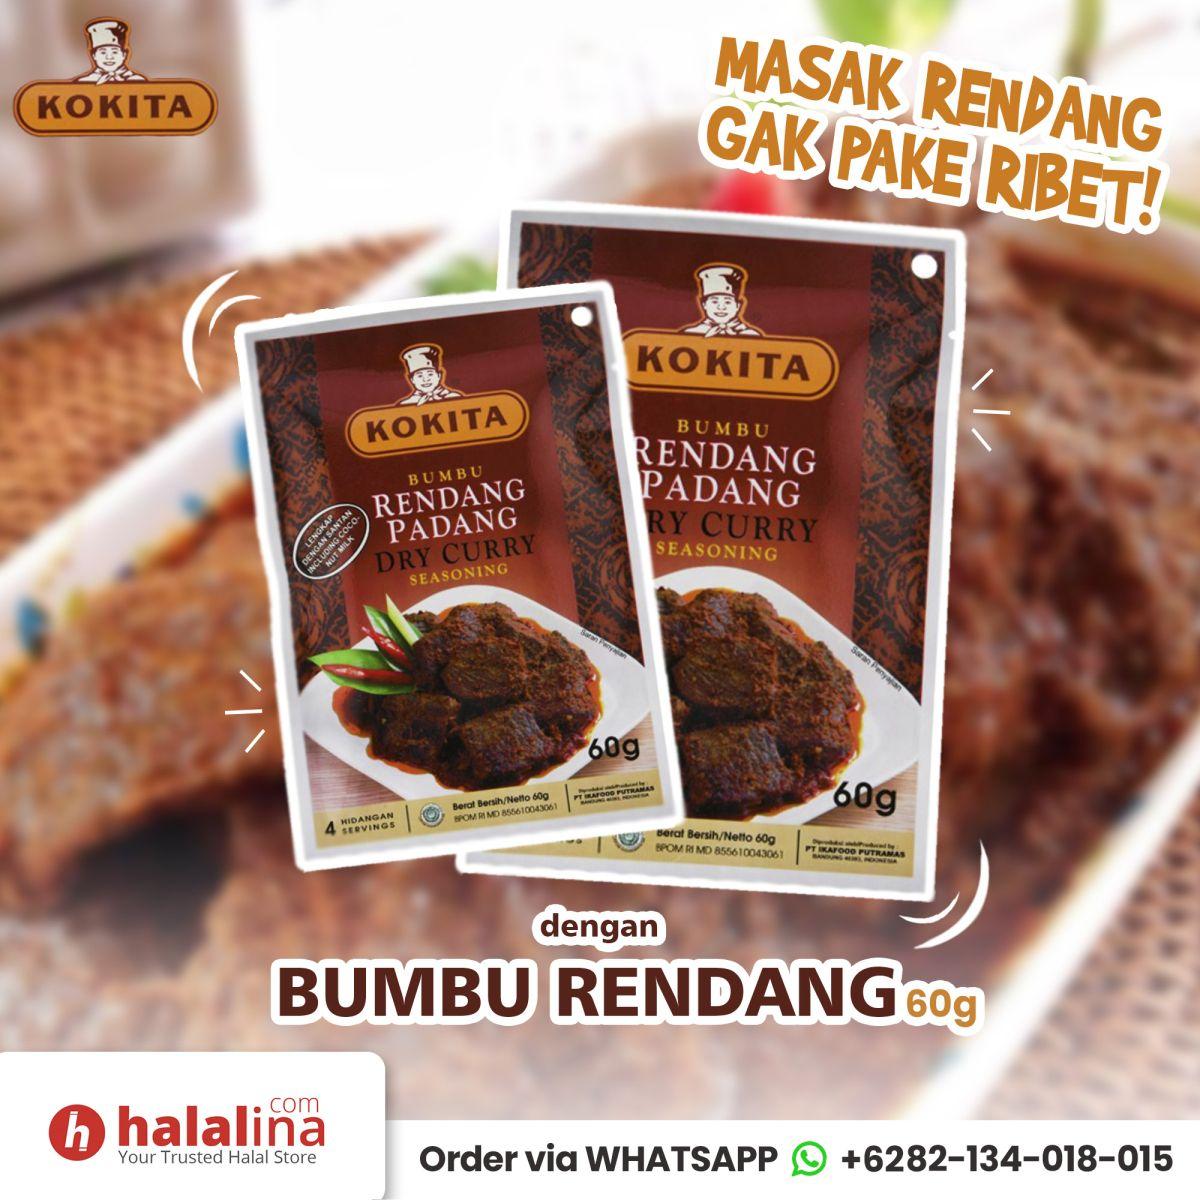 Phone 62 821 3401 8015 Halal Food Indonesia In Japan In 2020 Halal Recipes Halal Snacks Food